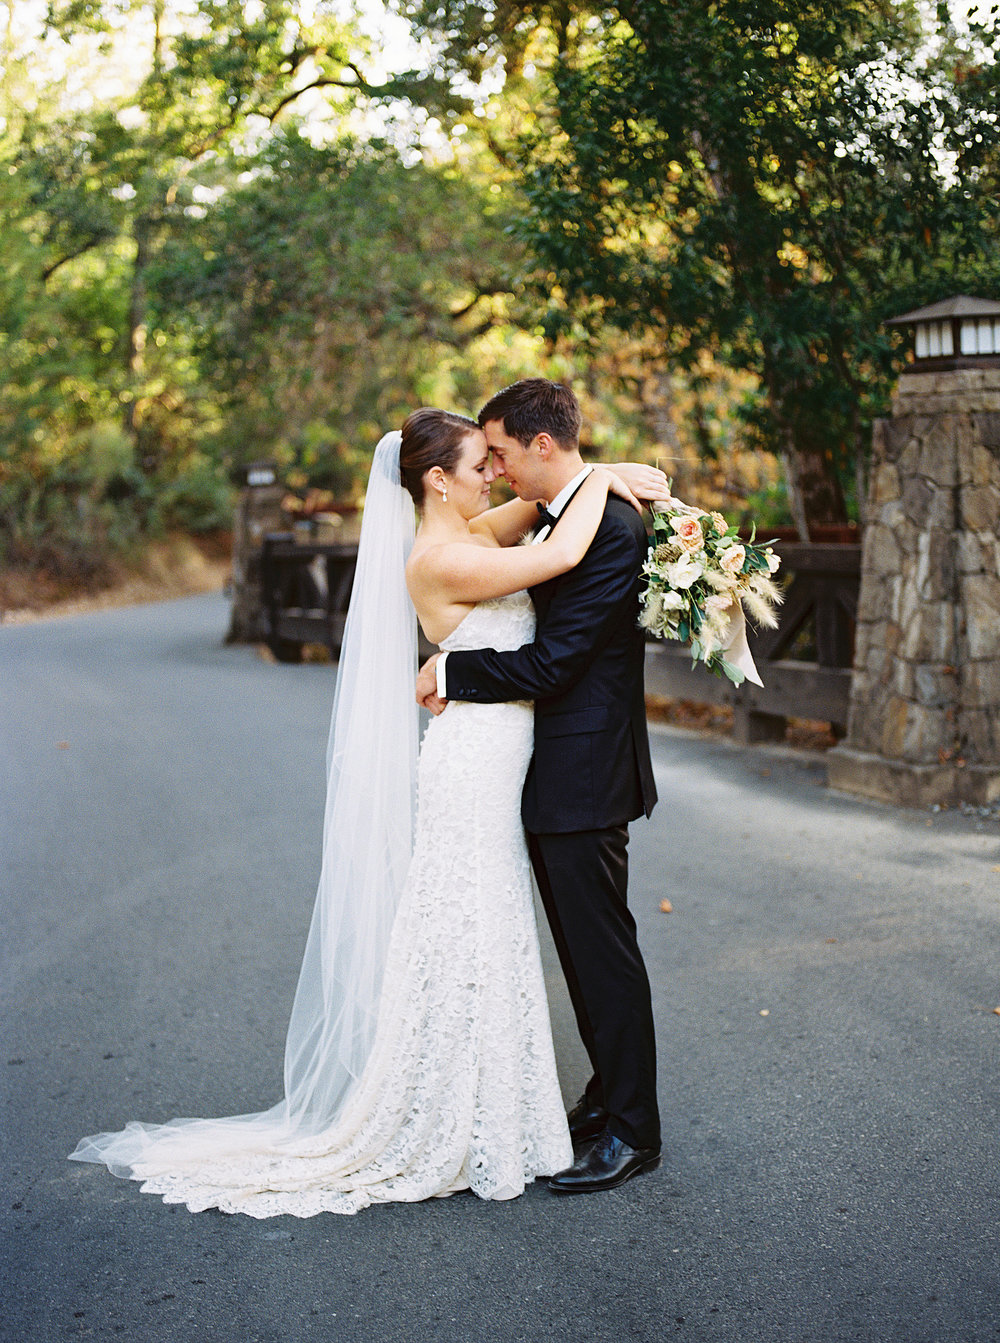 Best-Napa-Valley-Wedding-Venues-Calistoga-Ranch-(3).jpg